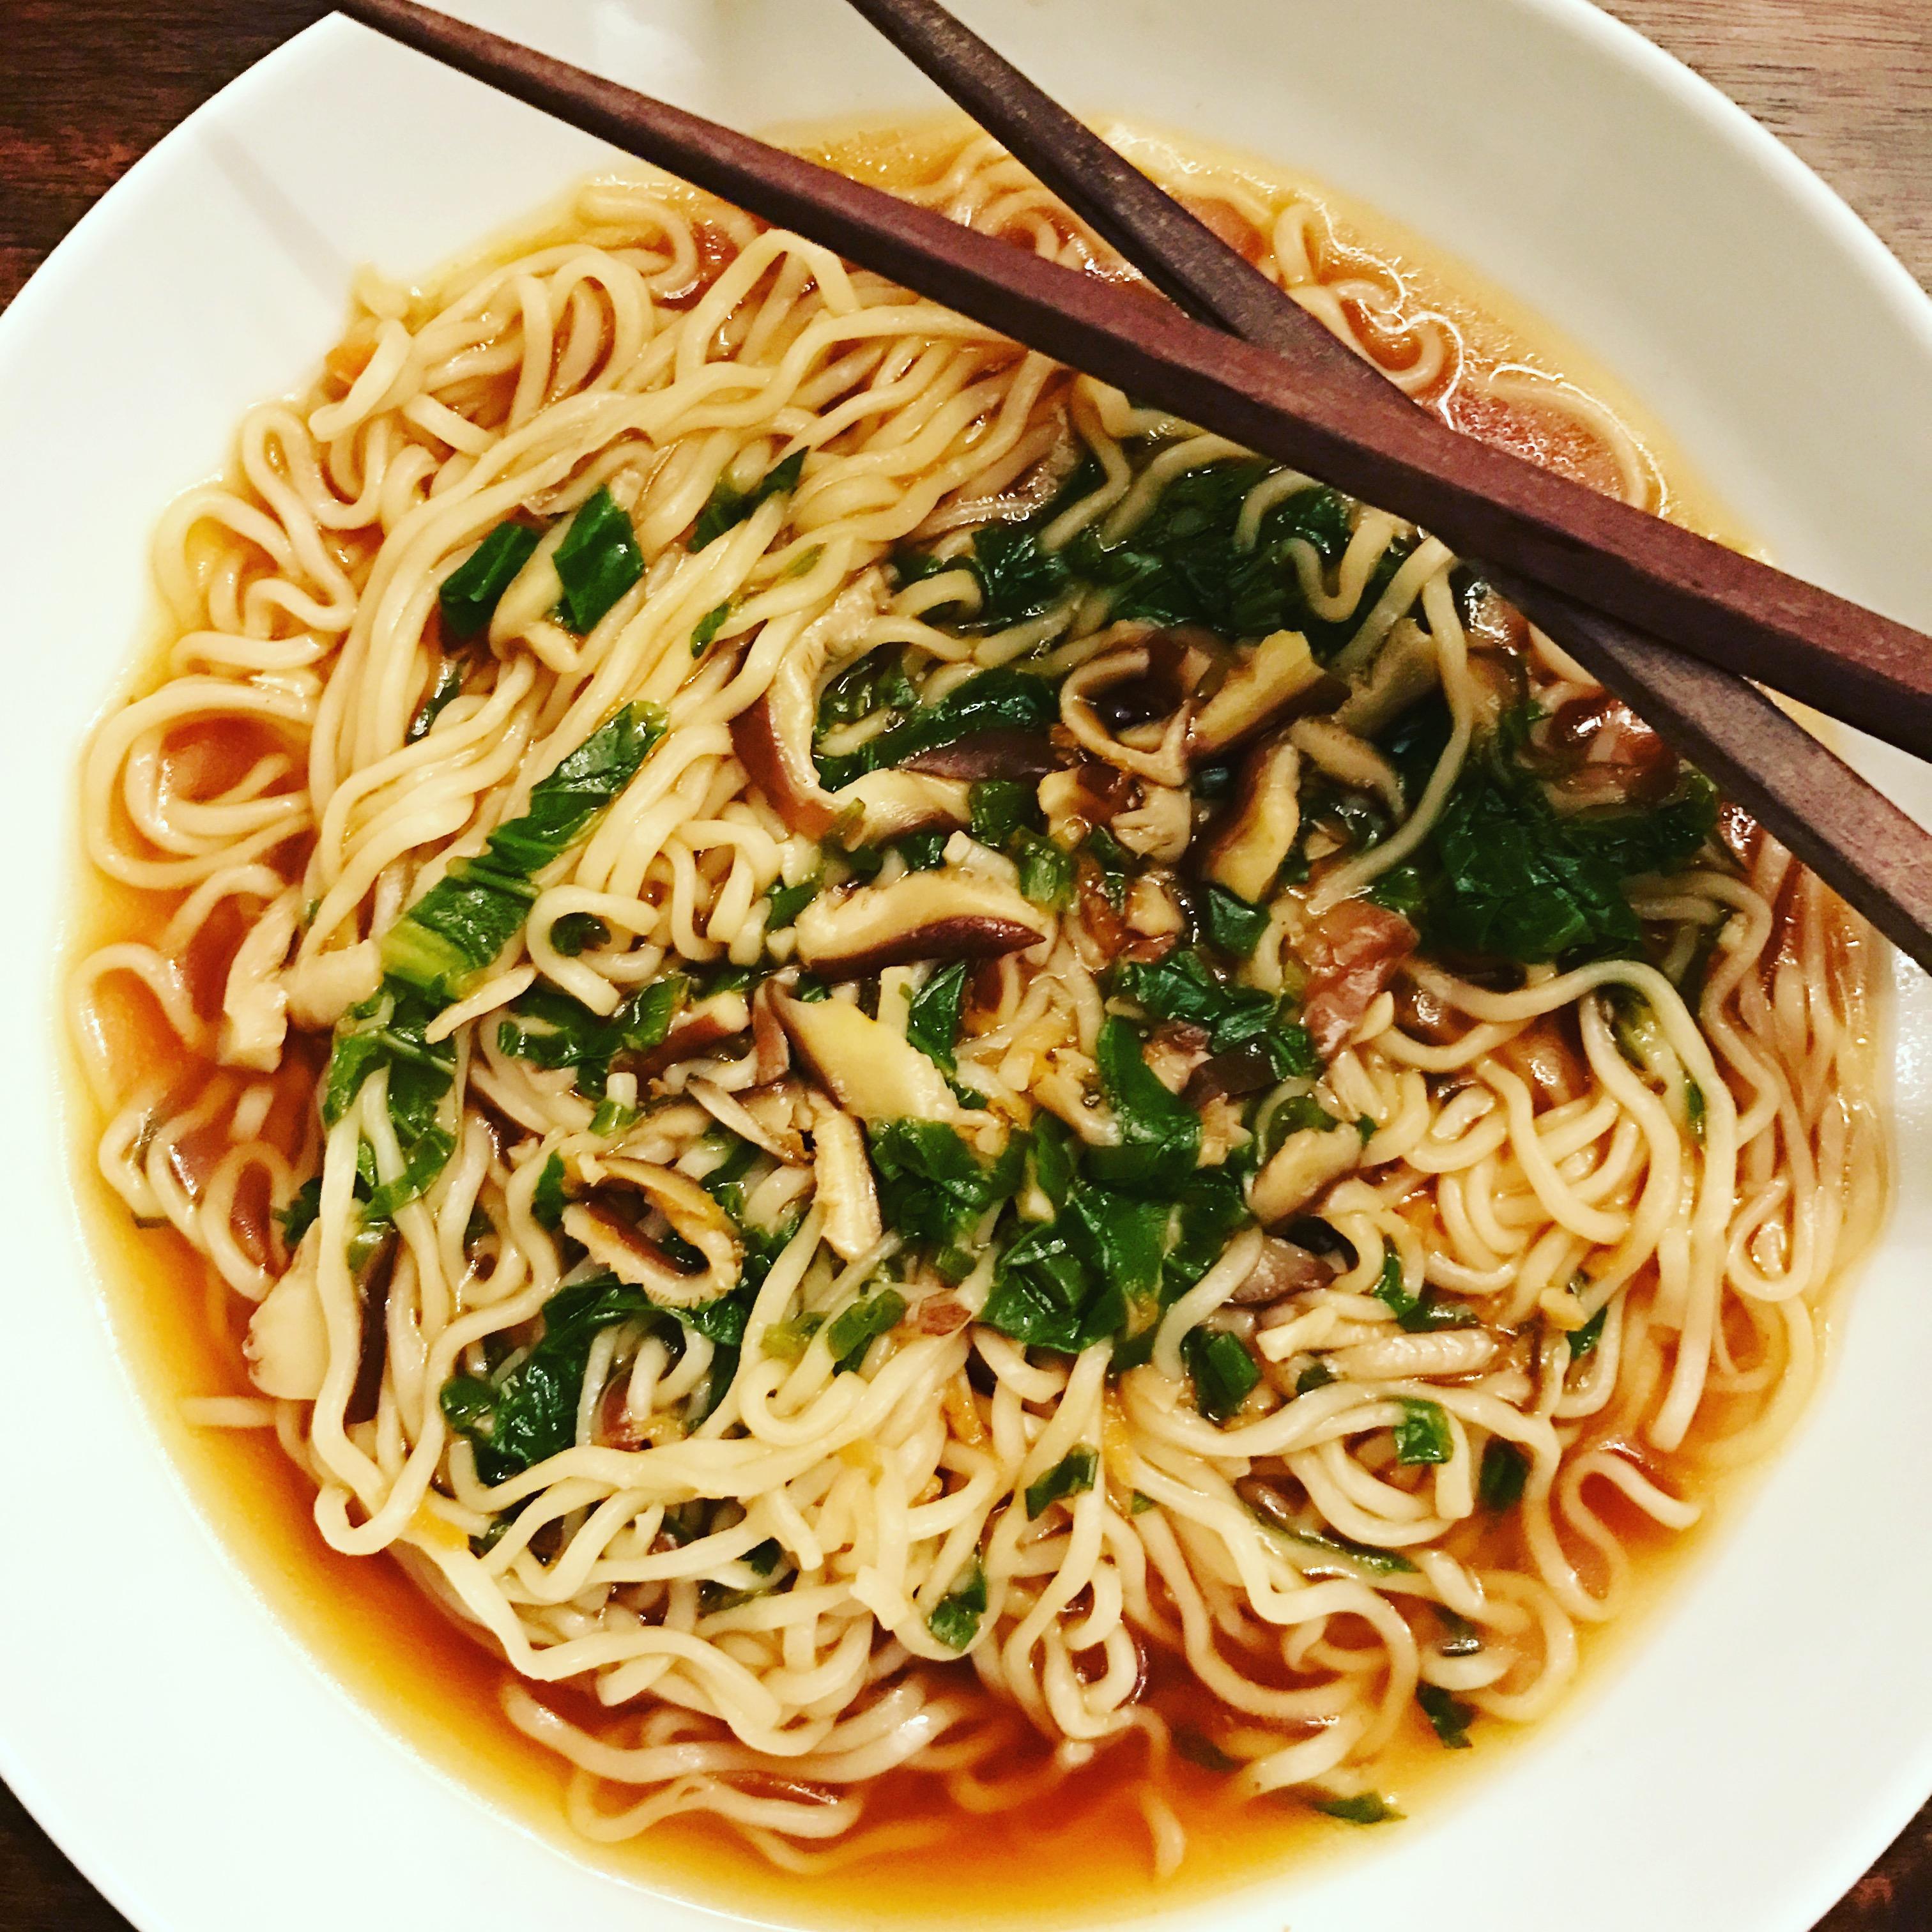 Sriracha Ramen Soup with Bok Choy and Shiitake Mushrooms